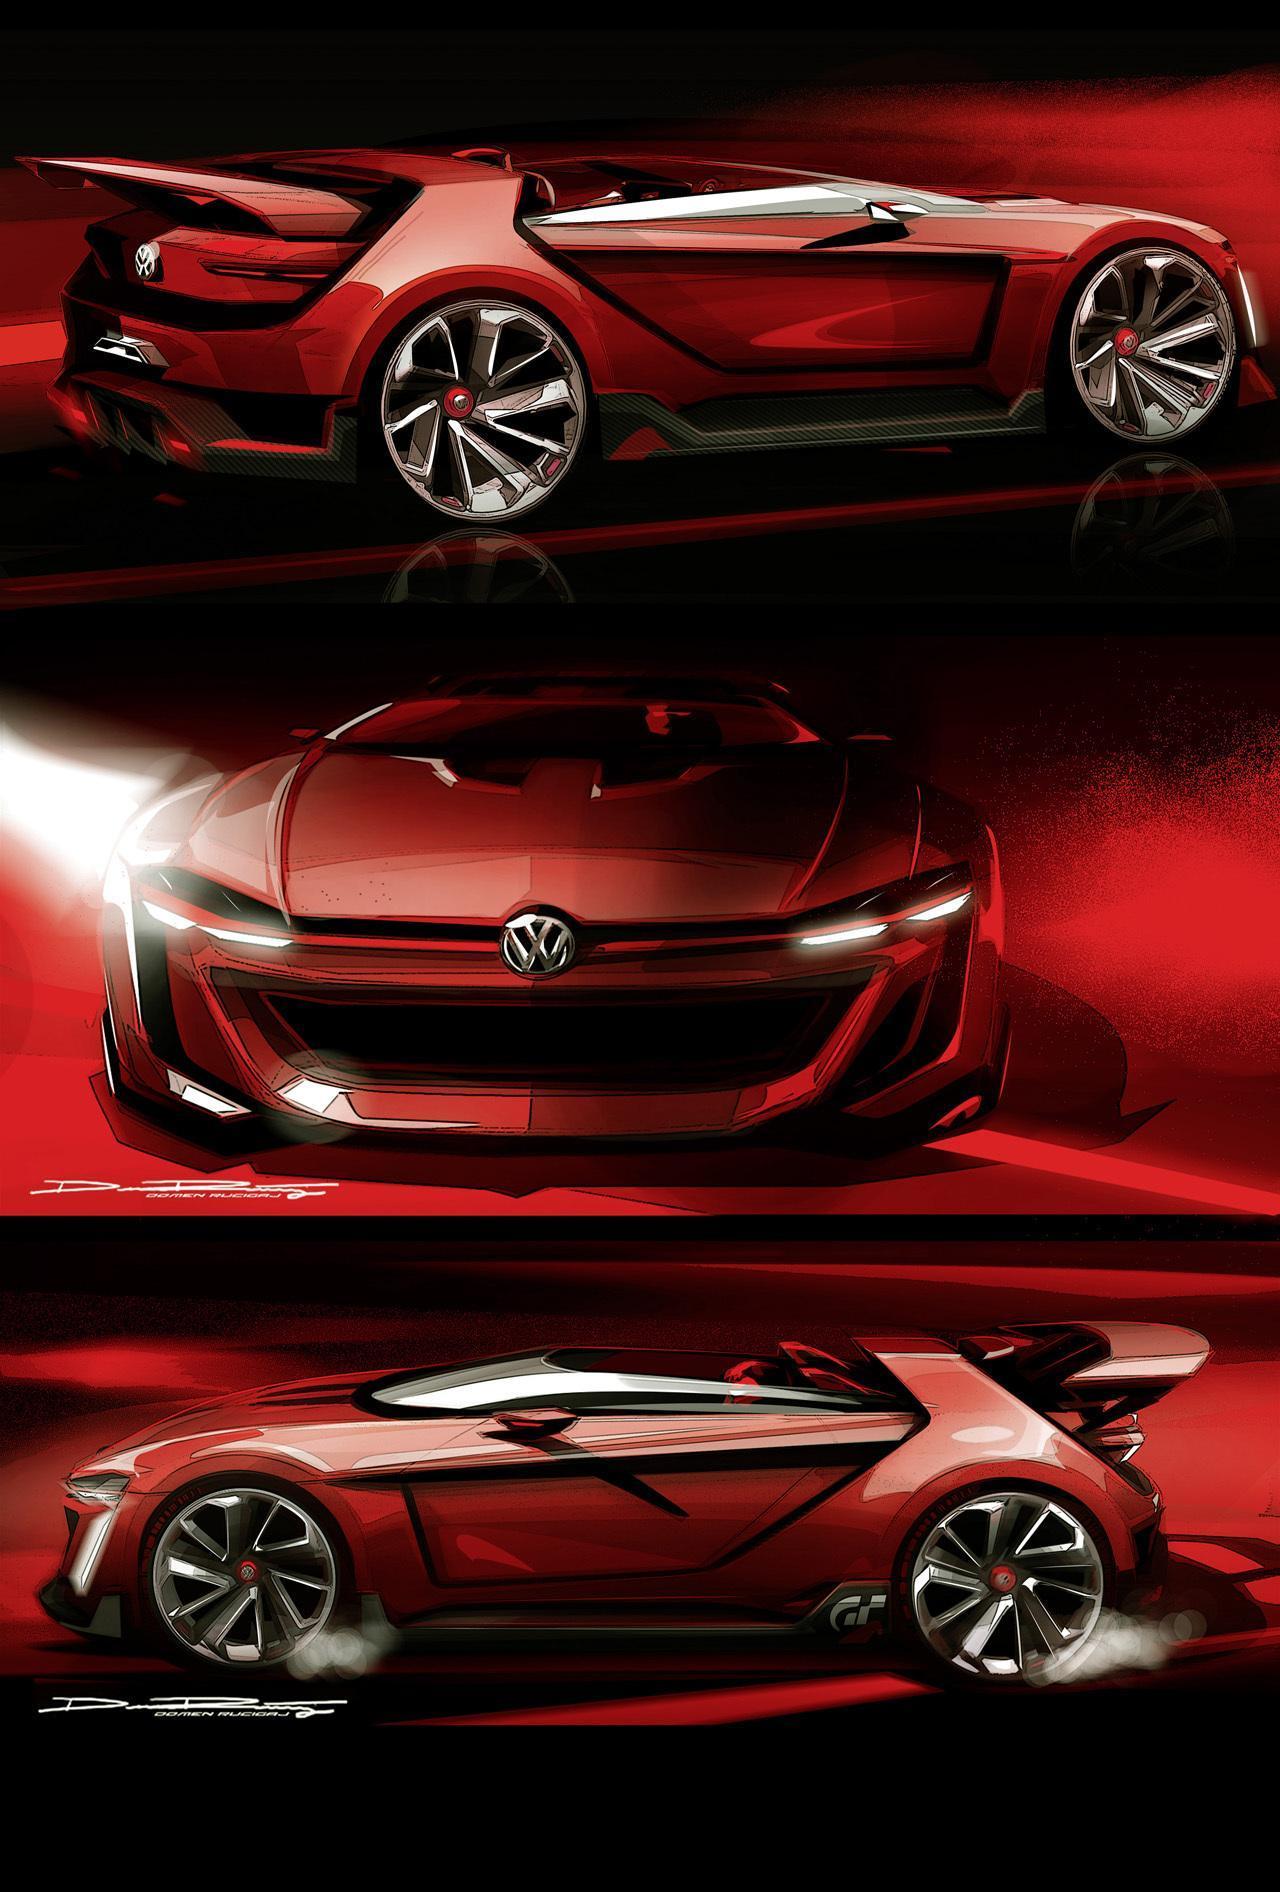 Foto de Volkswagen GTI Roadster Vision Gran Turismo (7/12)